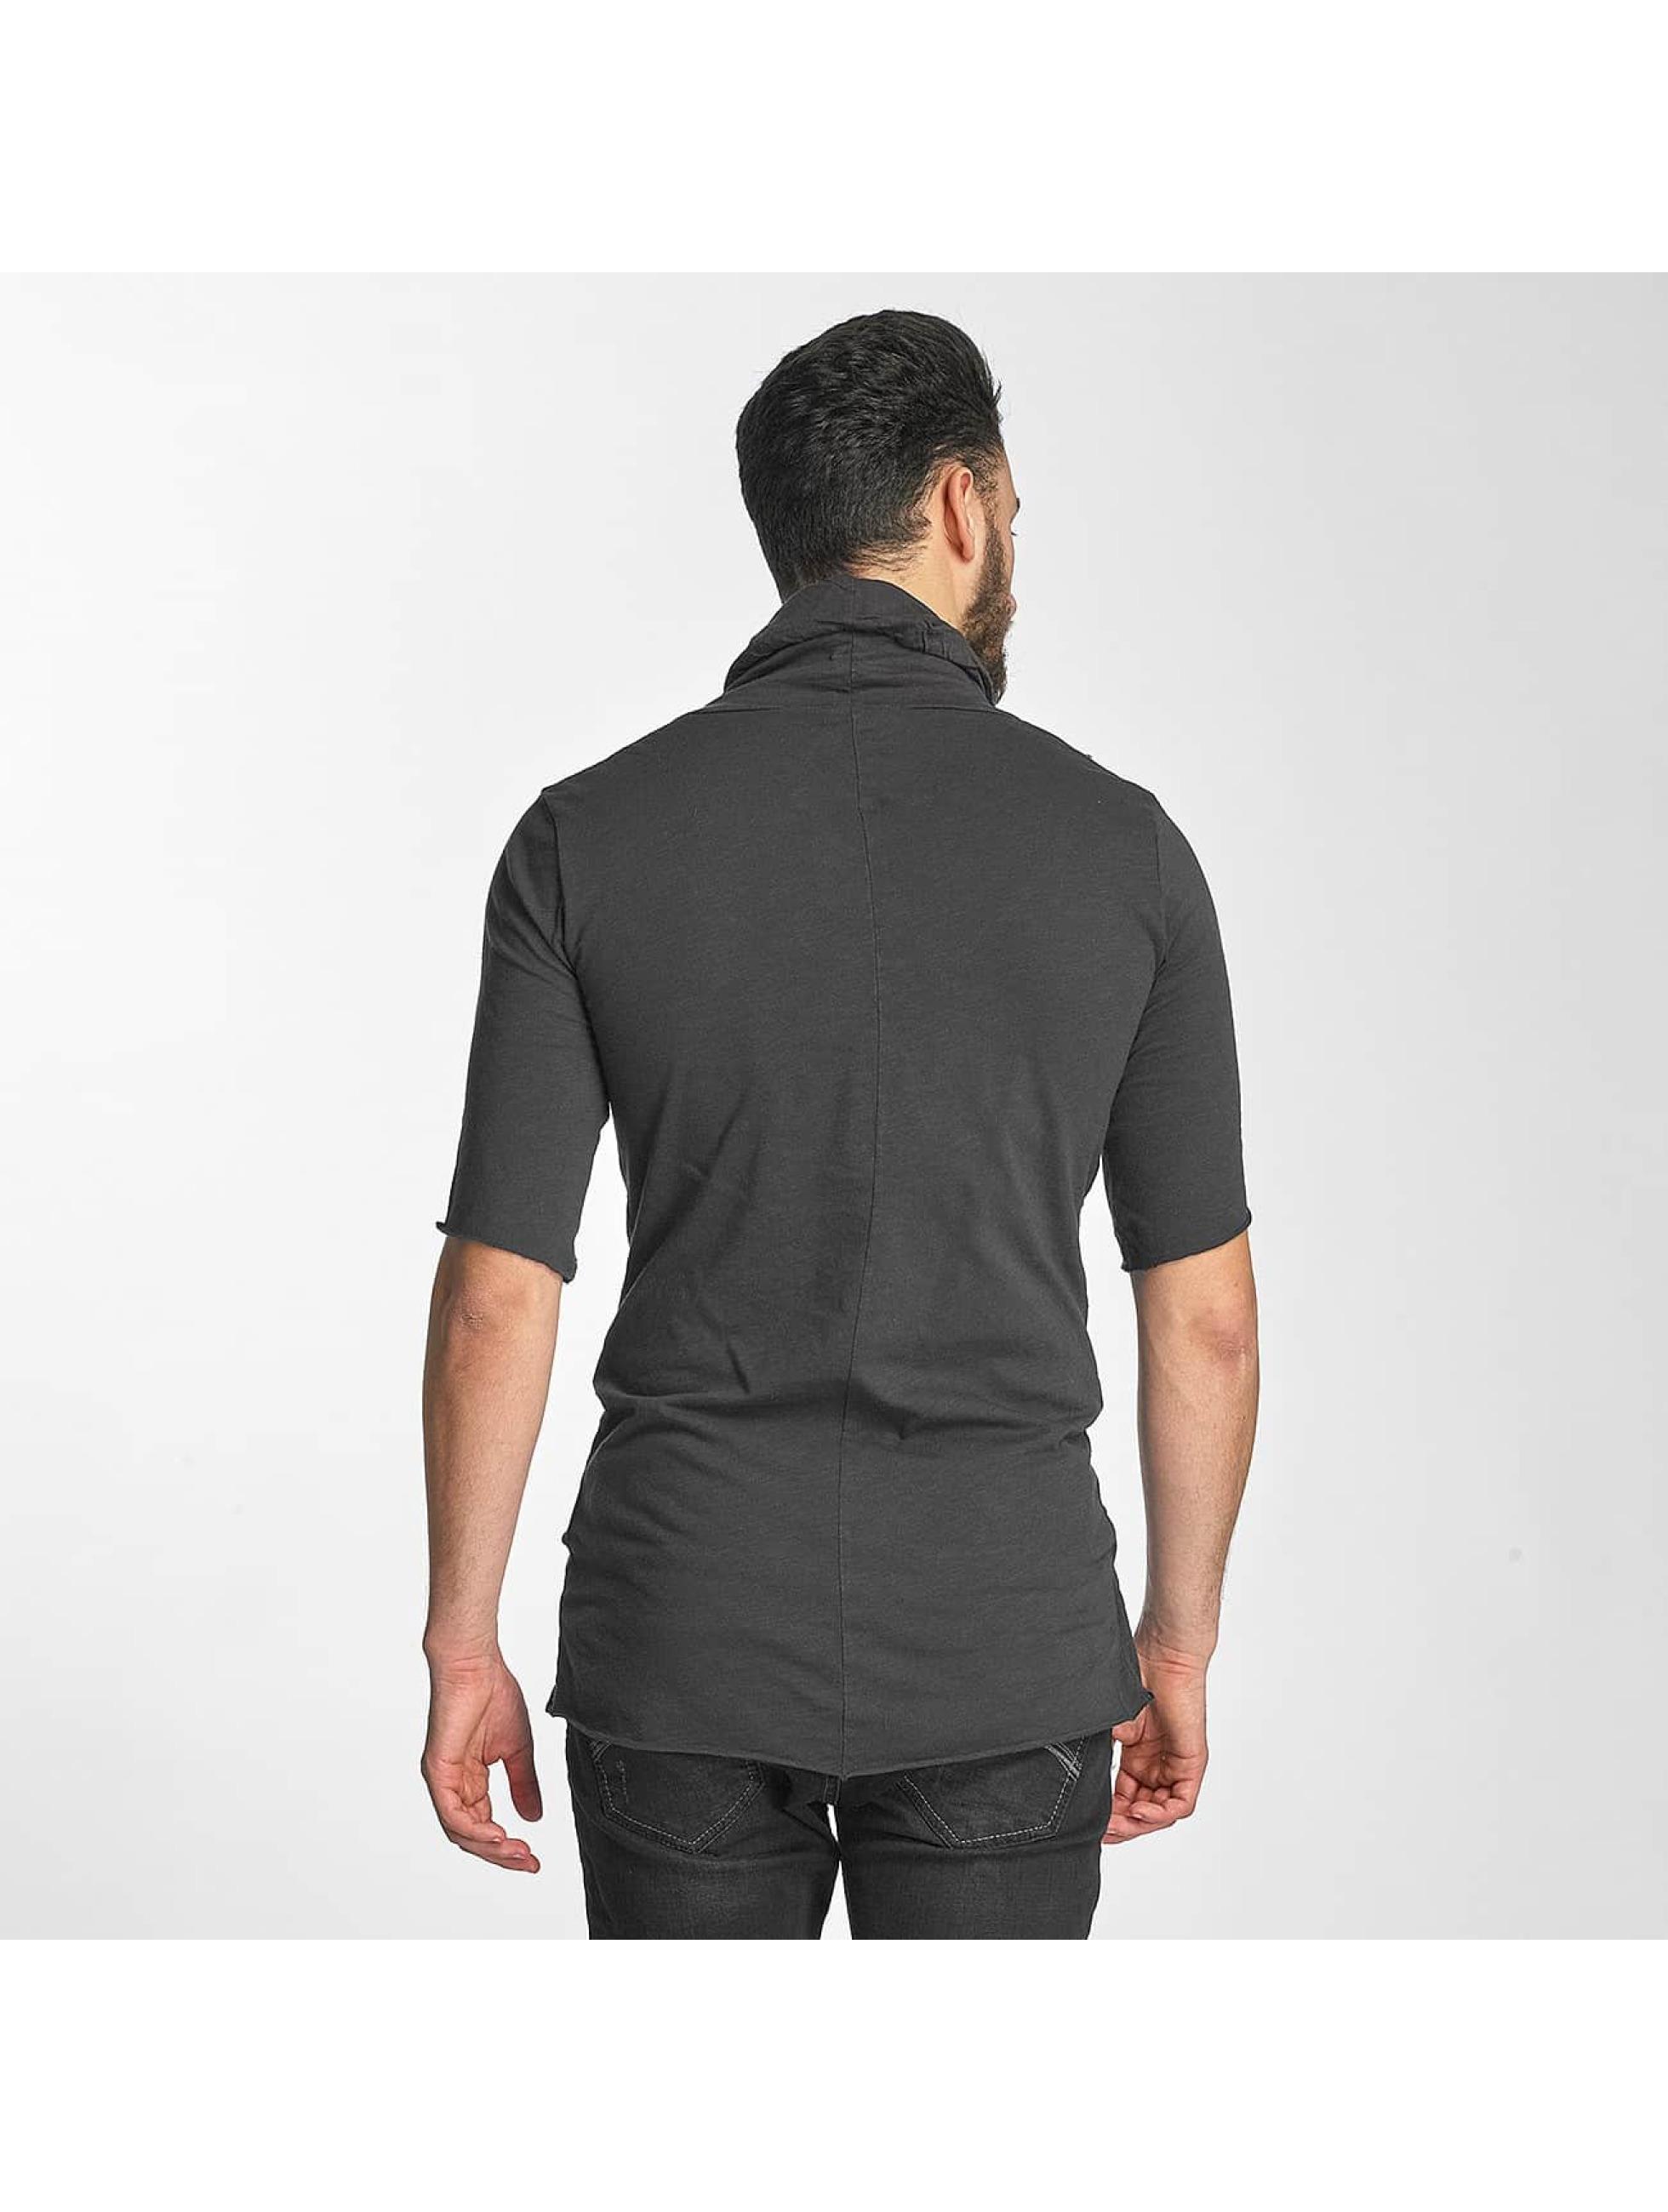 Red Bridge T-Shirt Asymmetric gray